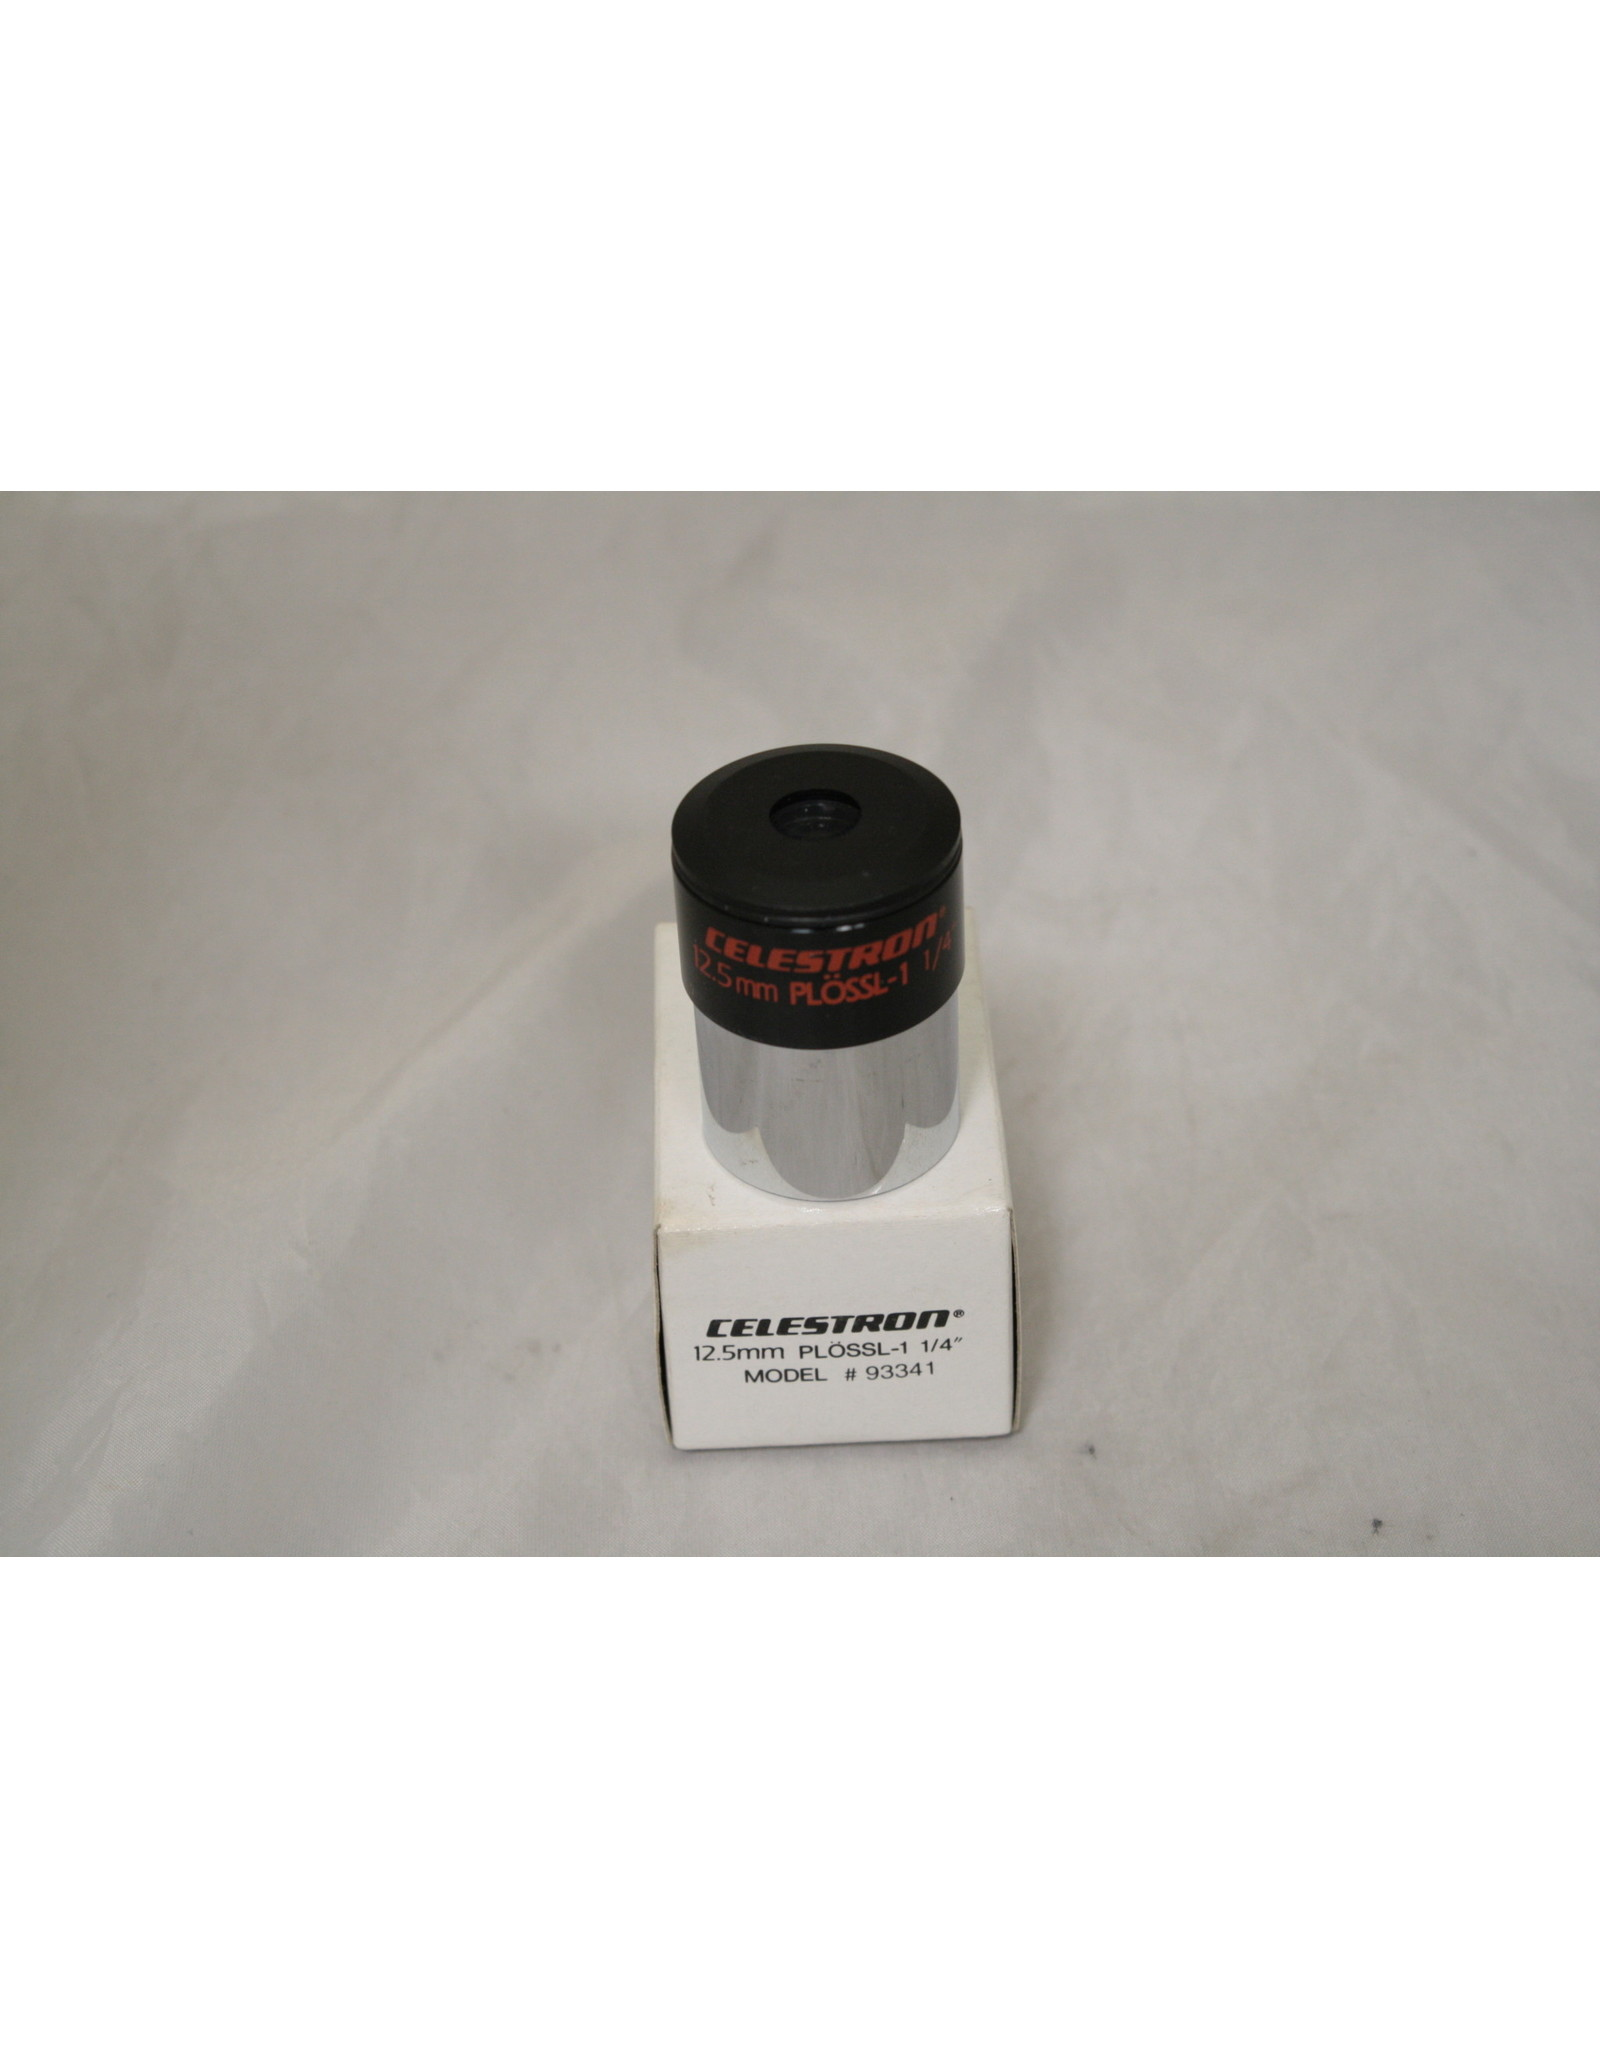 Celestron Celestron 12.5mm Plossl